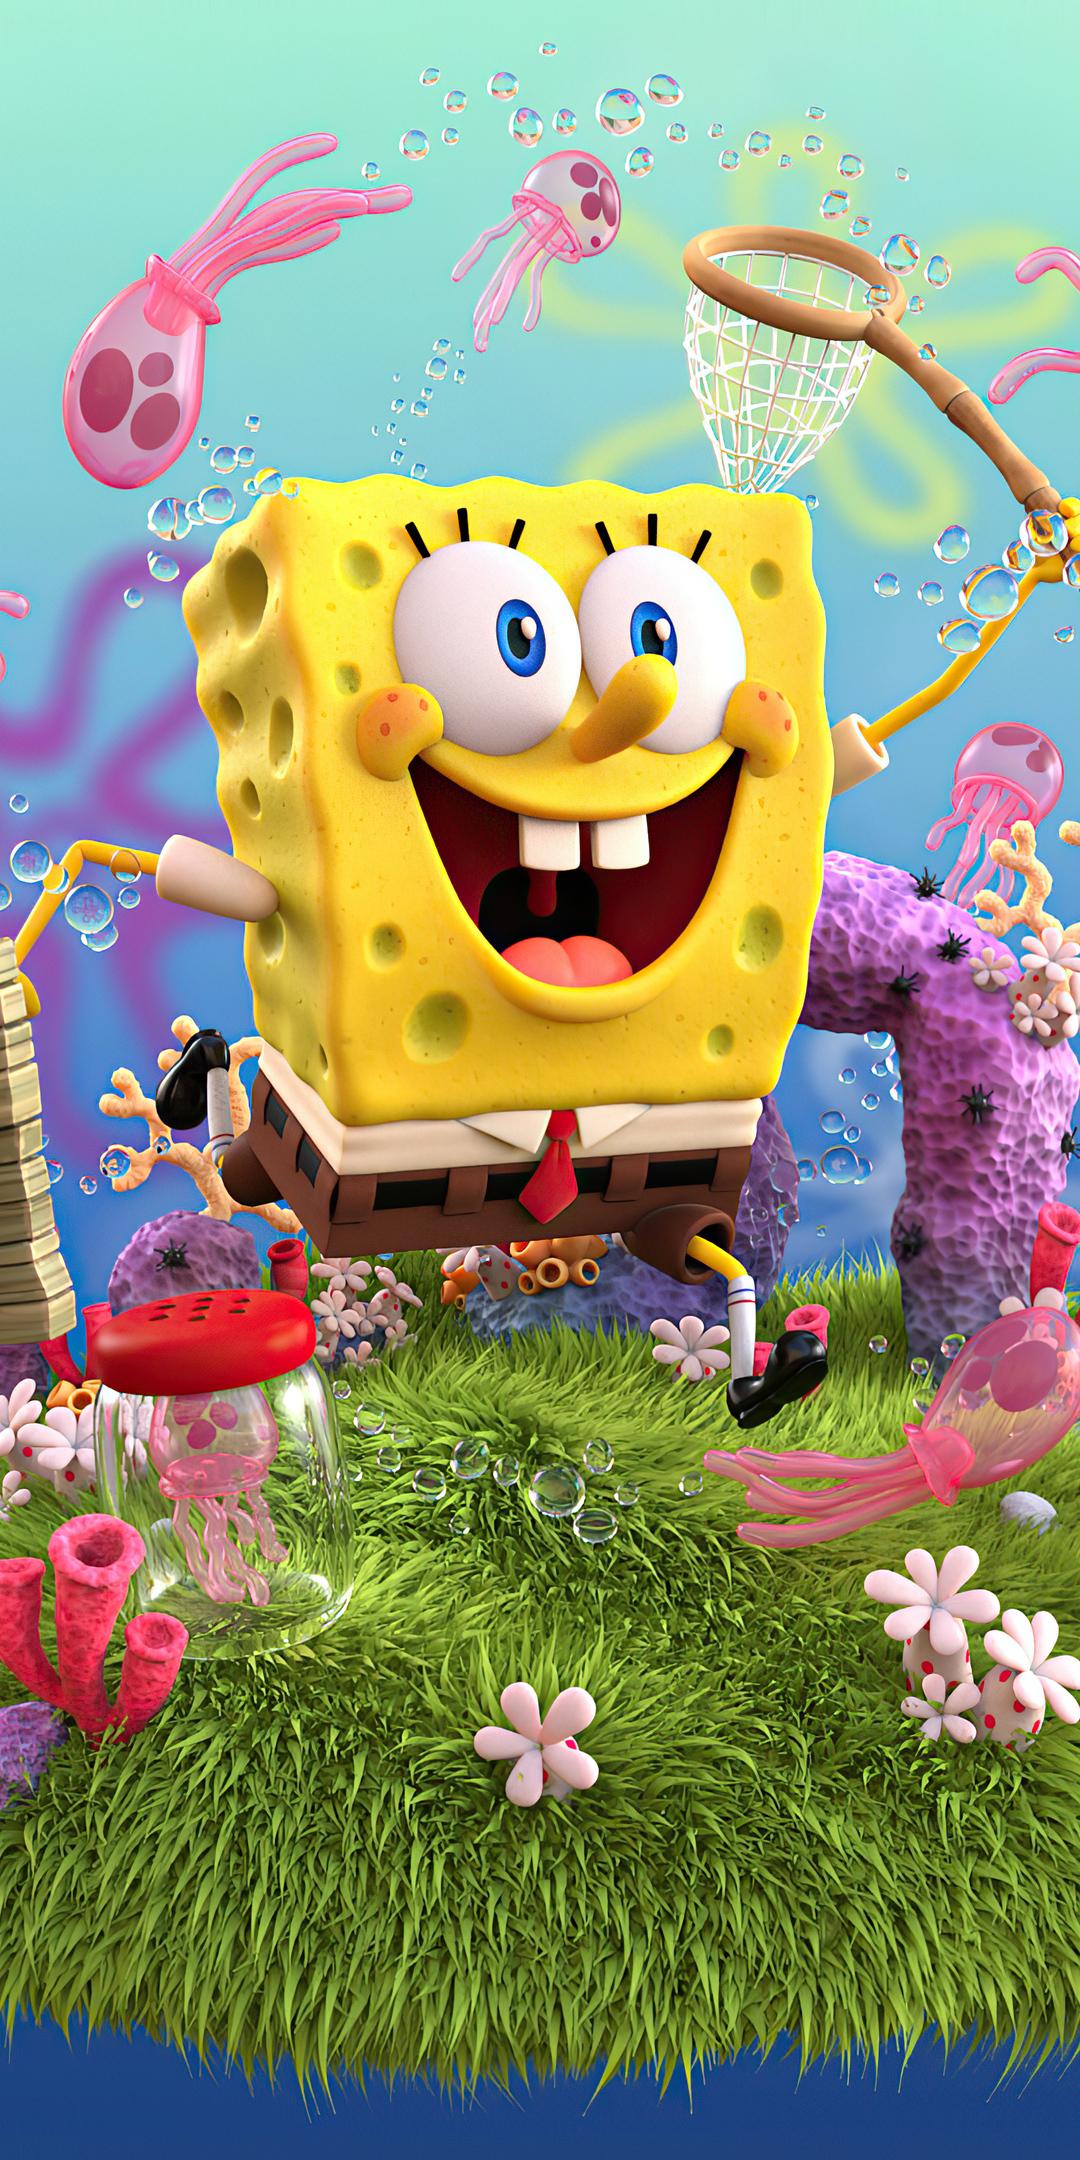 1080x2160 SpongeBob SquarePants 4k 2020 One Plus 5T,Honor ...